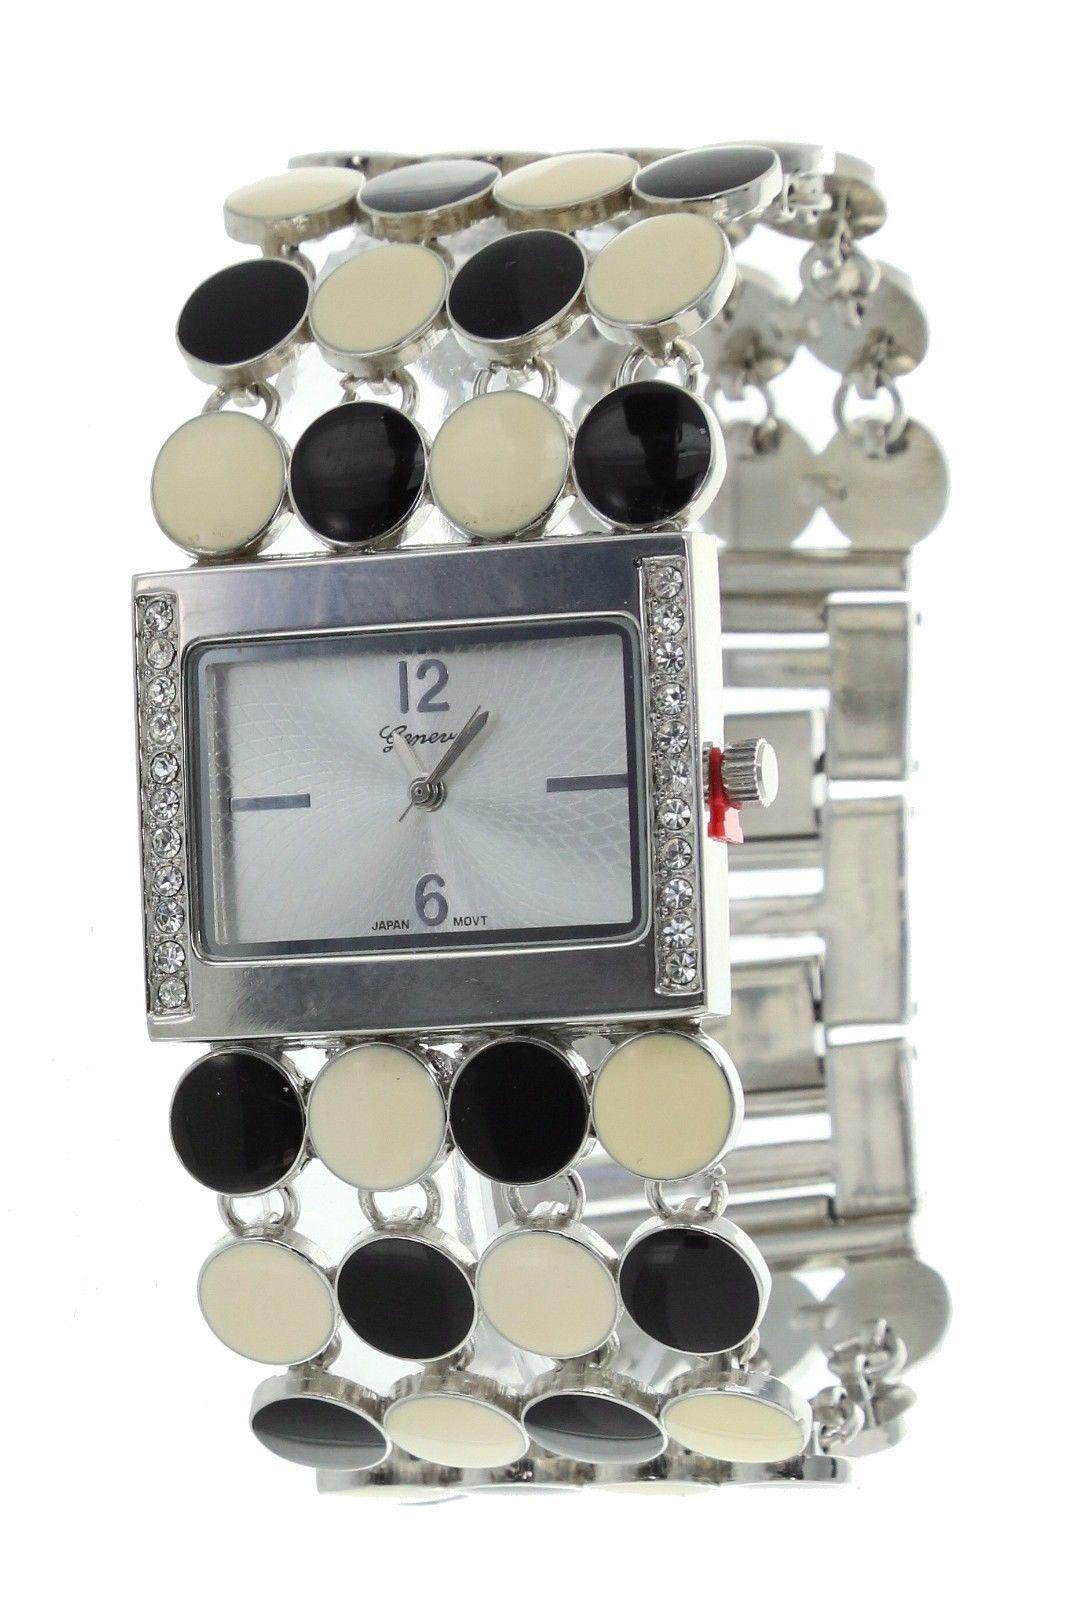 Ladies Geneva Quartz Wristwatch White Gold Finish With Round Enamel Circles Band